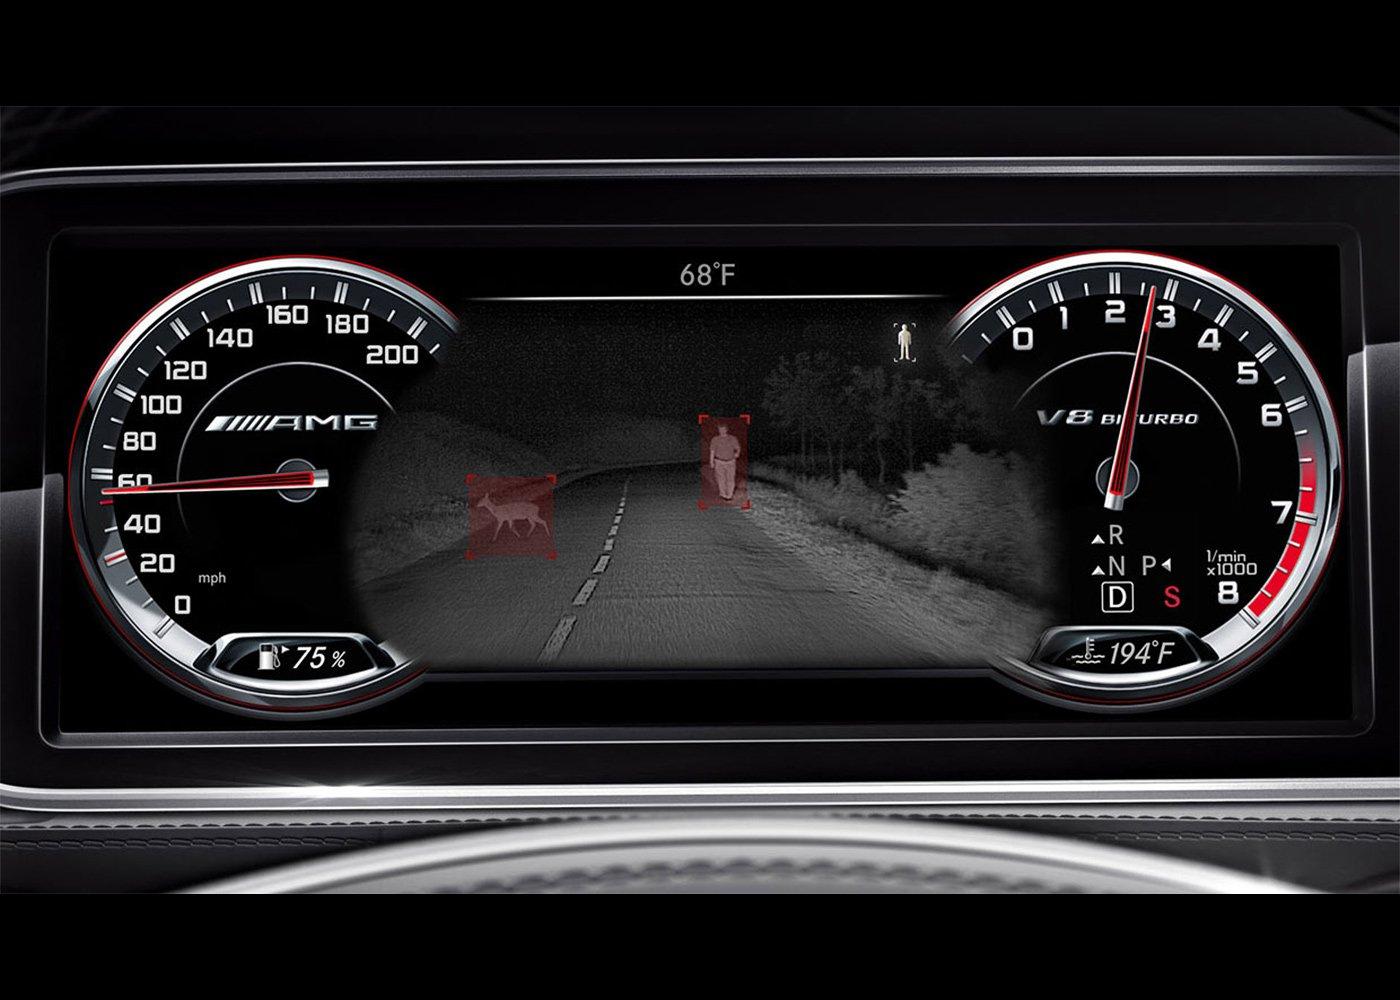 Mercedes-Benz Night View Assist